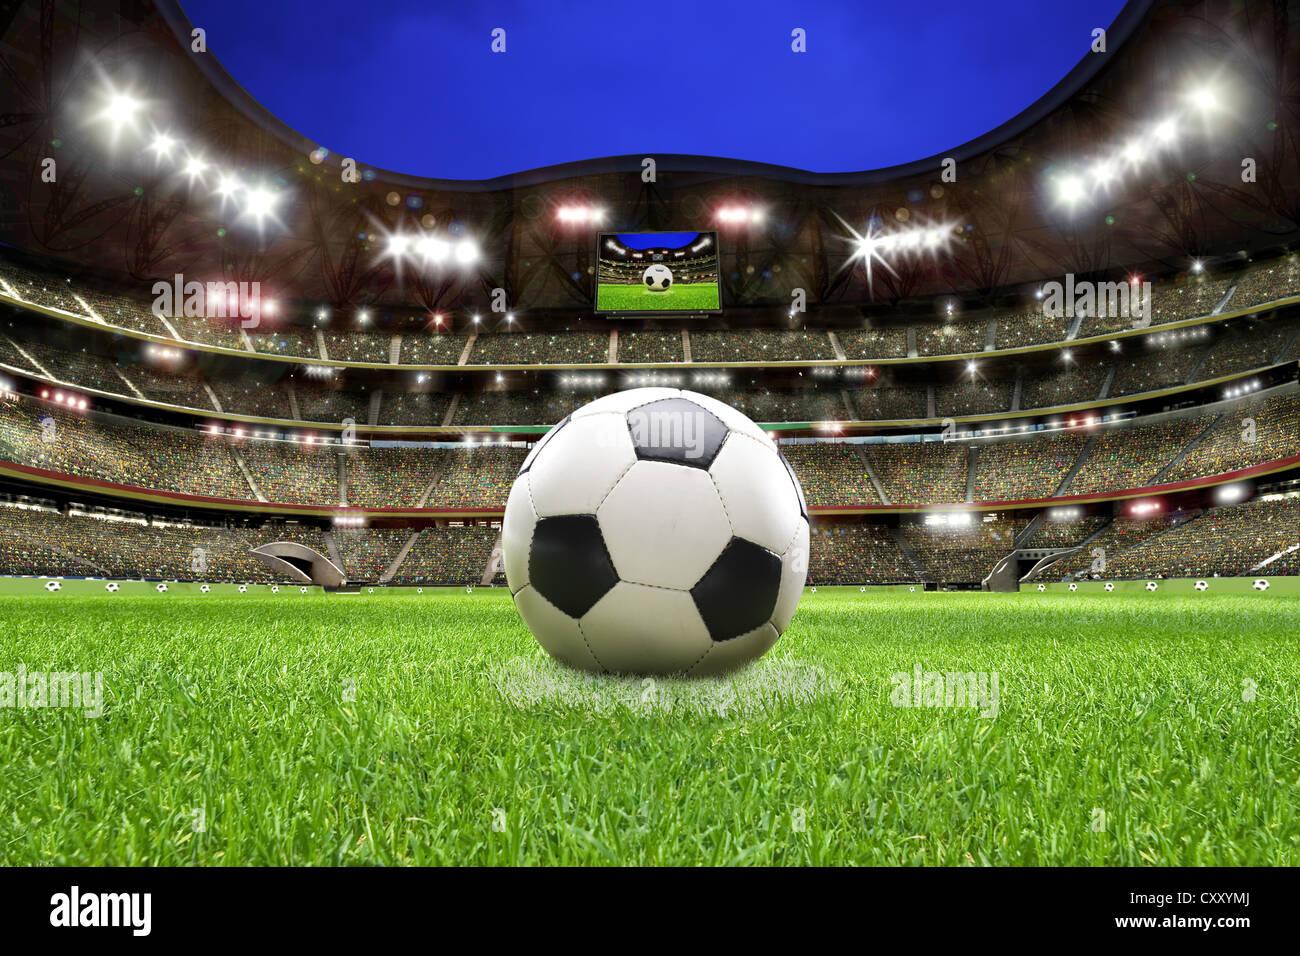 Fußball, Fußball-Stadion, Rasen, Zuschauertribüne Stockbild